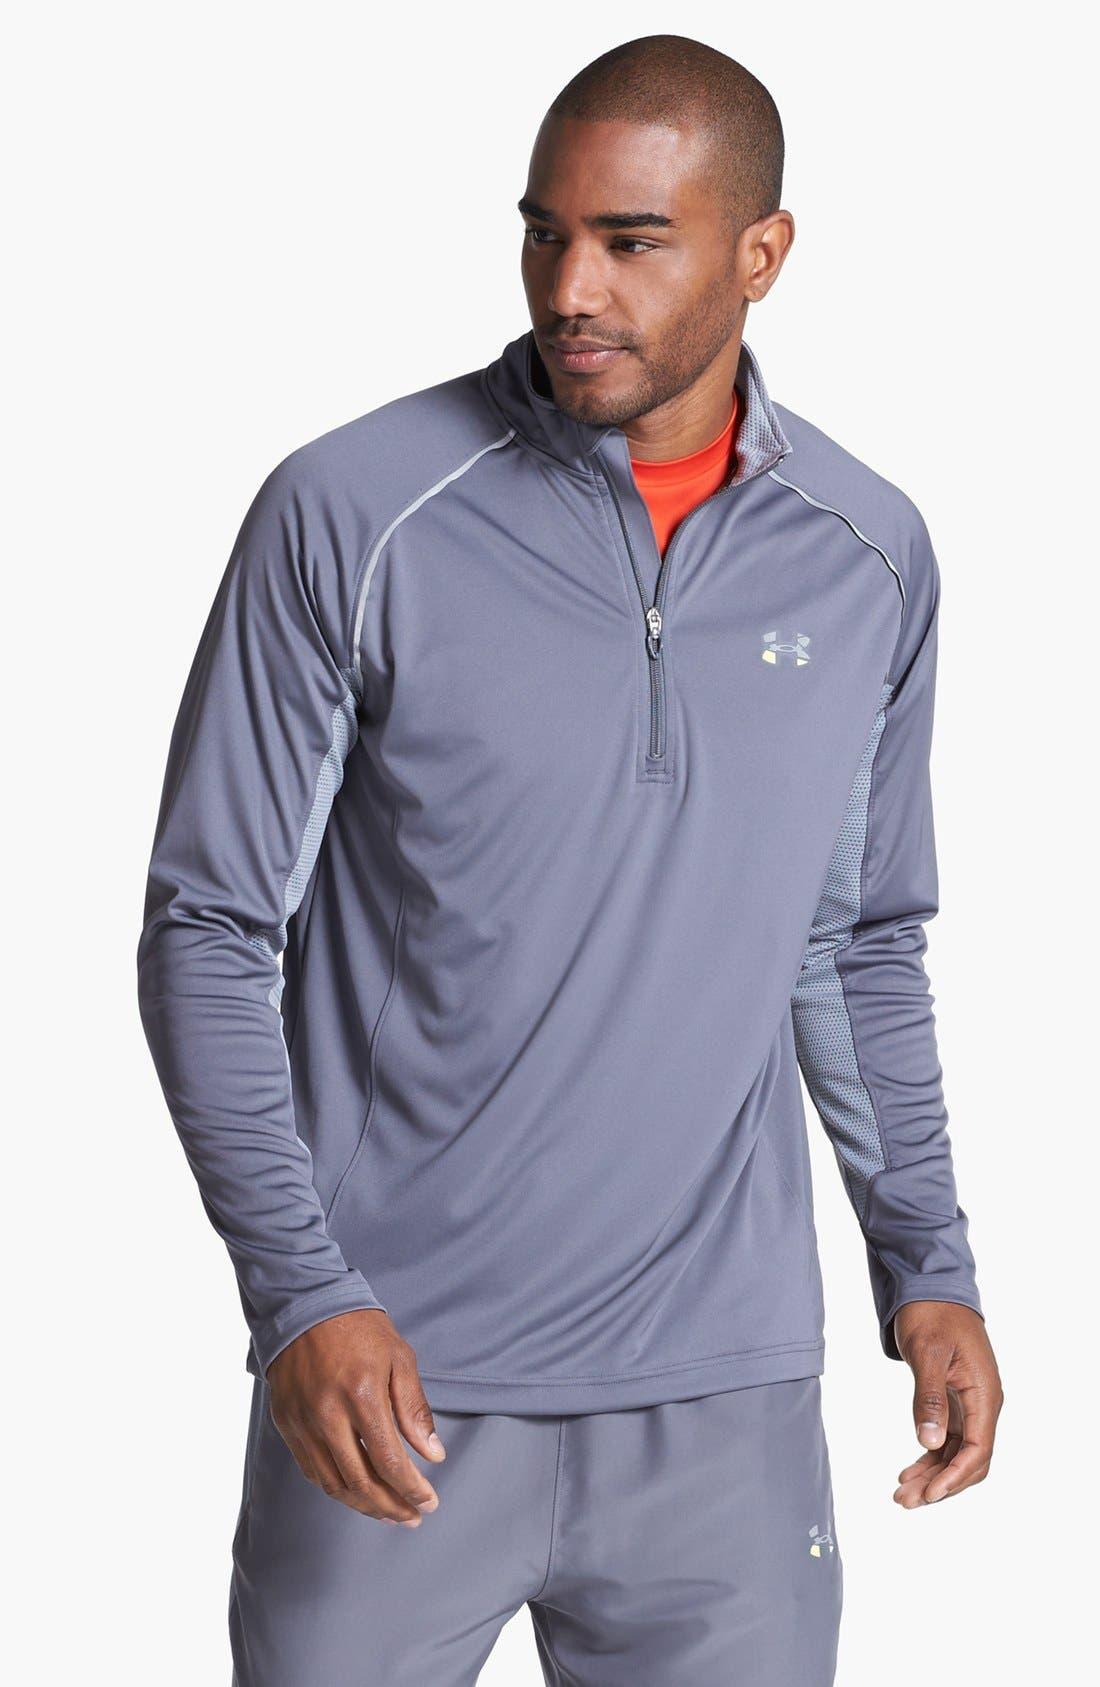 Alternate Image 1 Selected - Under Armour Quarter Zip Shirt